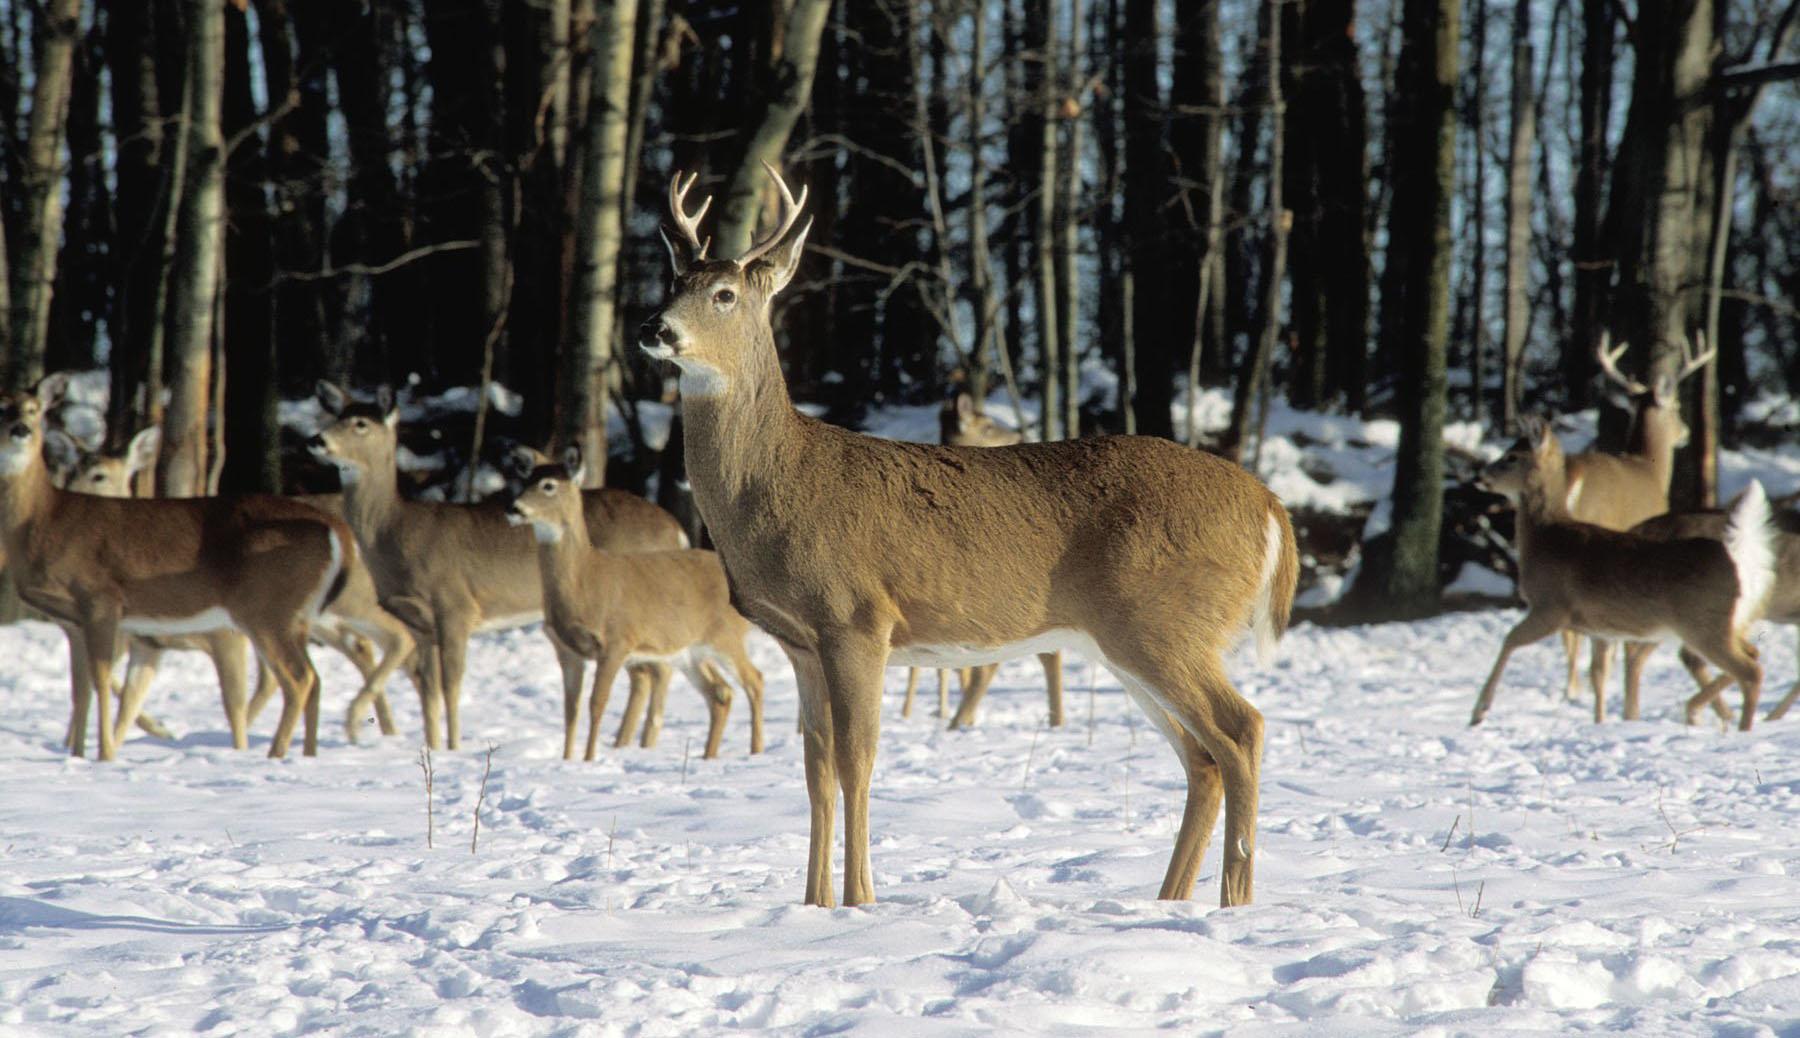 Opening Day Of Deer Hunting Season In Michigan Brings pertaining to Michigan Deer Season 2021